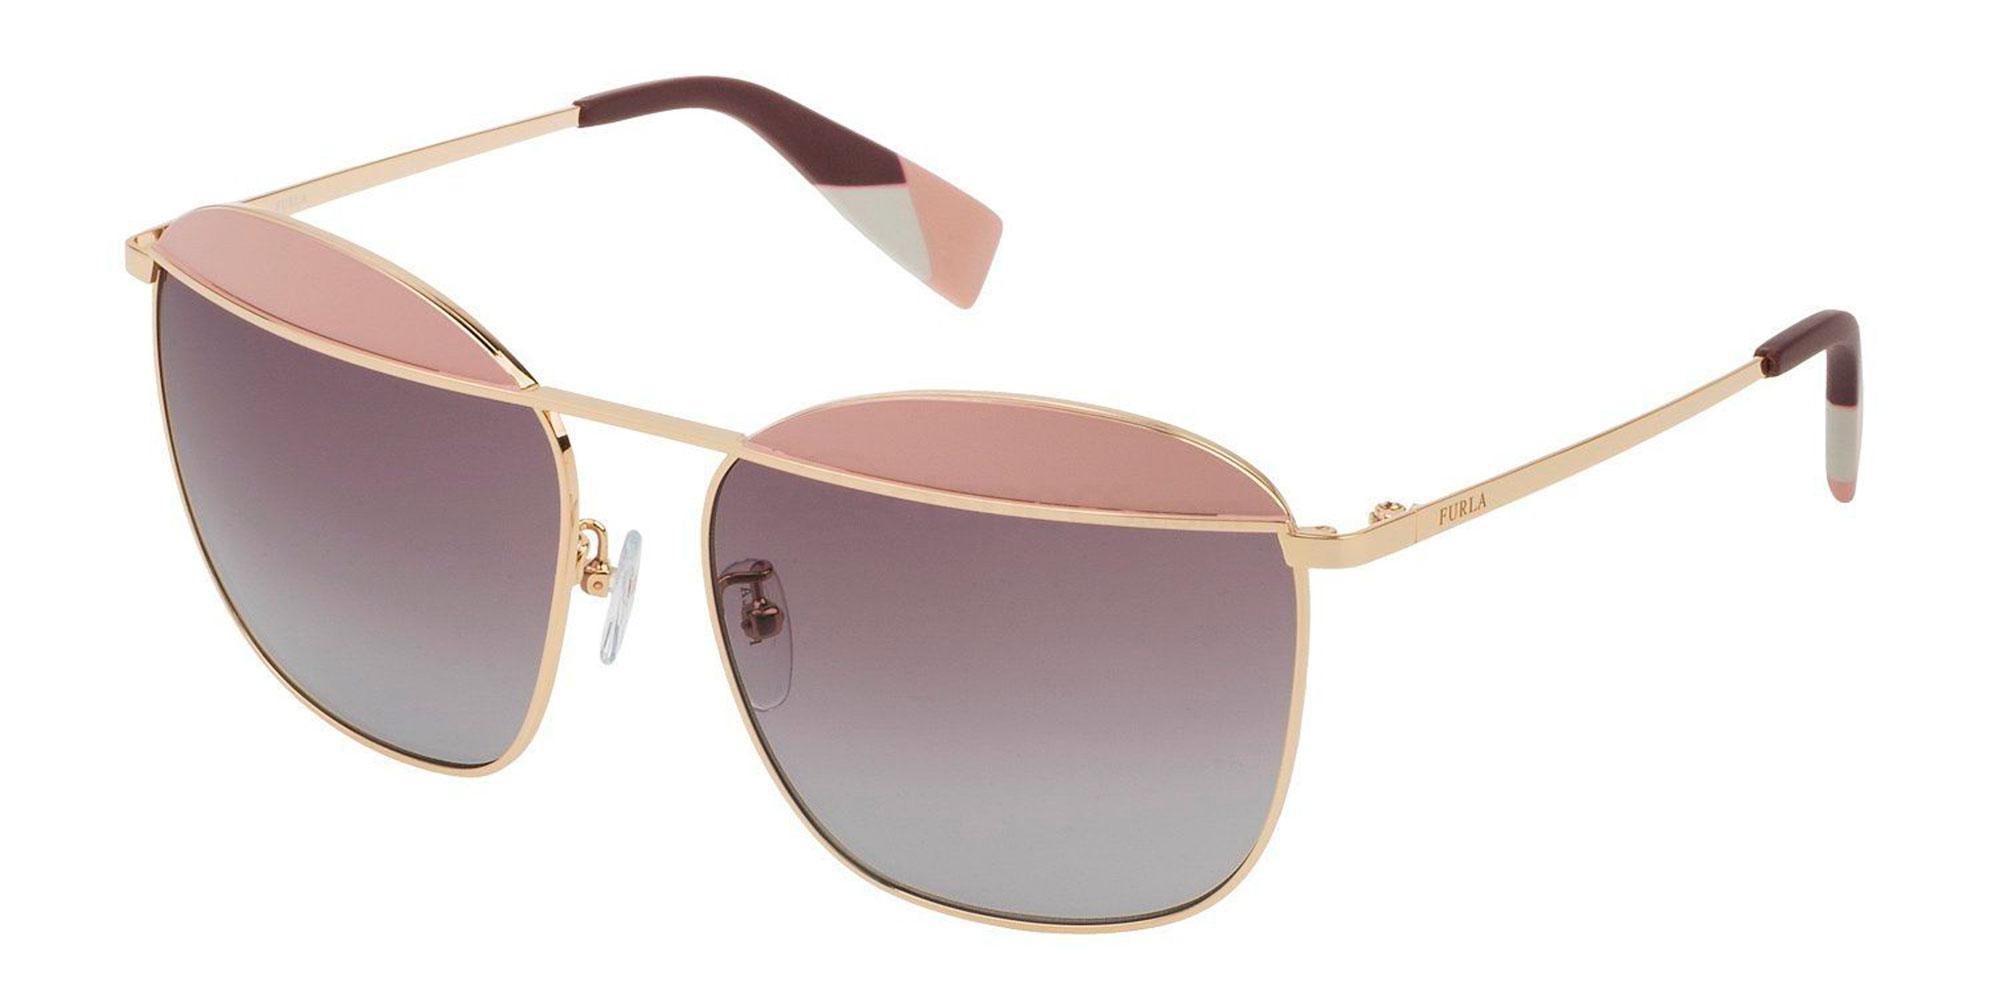 0323 SFU237 Sunglasses, Furla